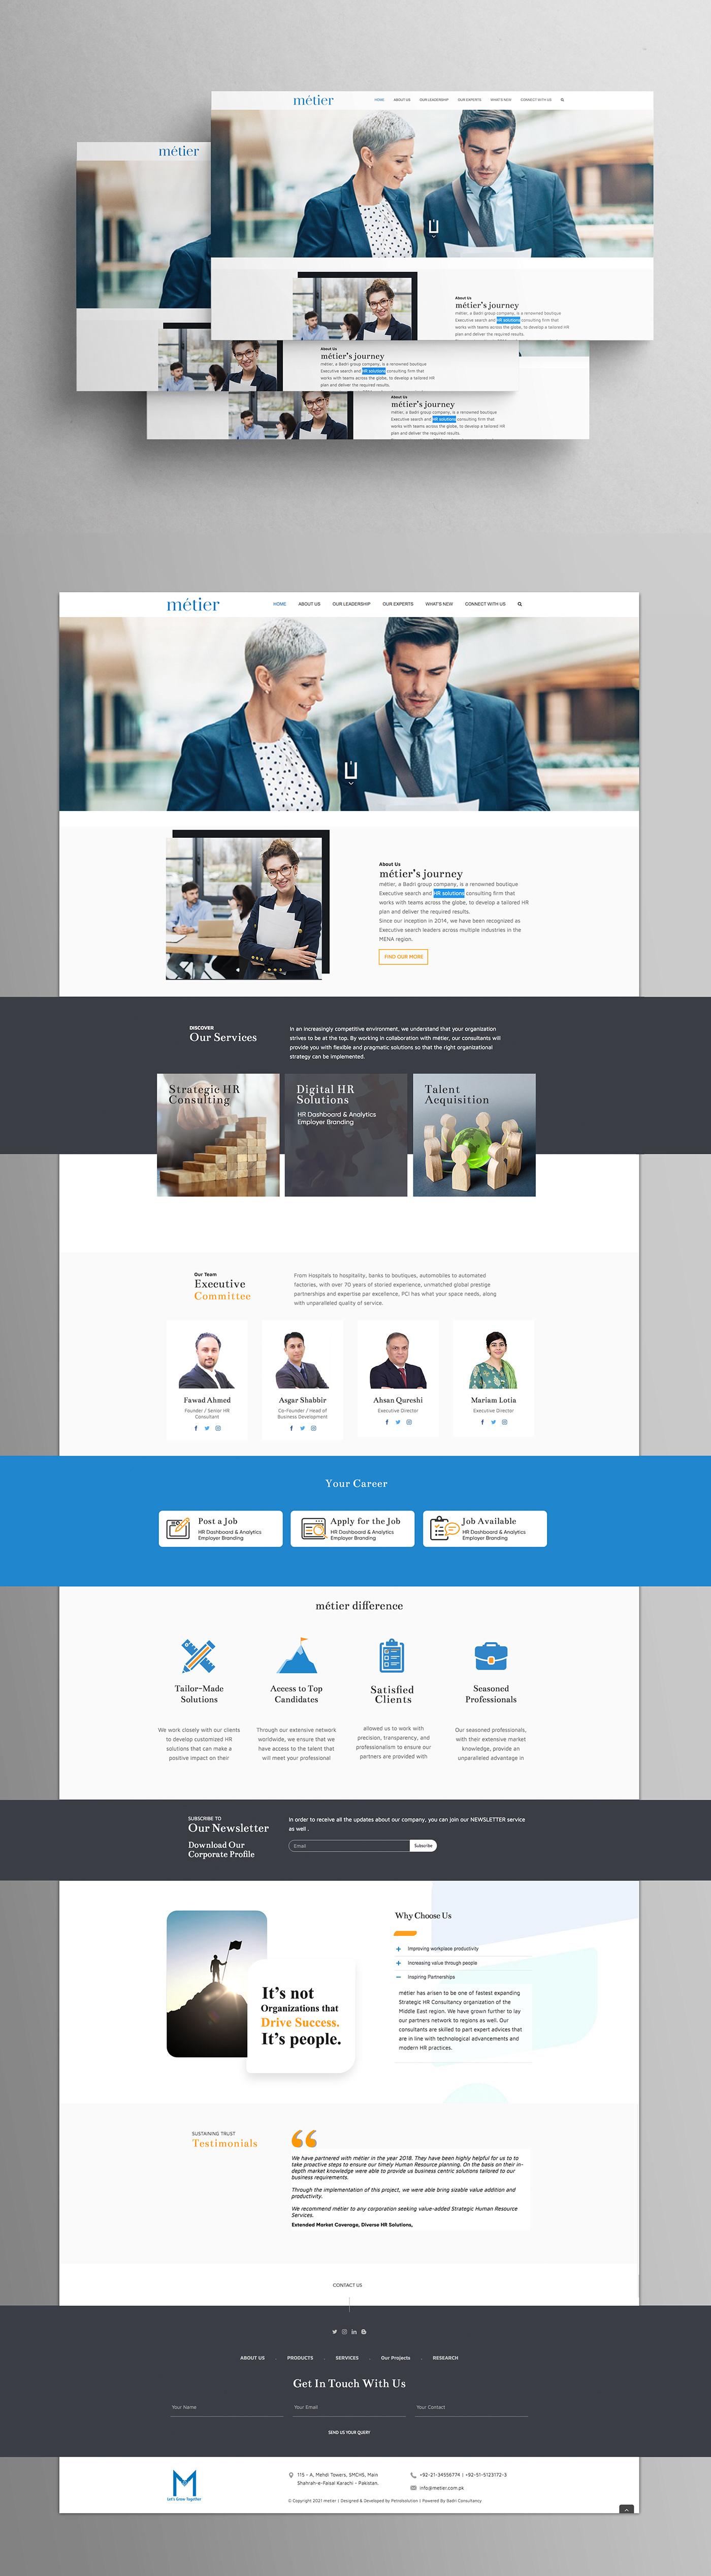 blue theme HR hr solution HR Website nabsgroup UI ux Web web mockup Web UI UX